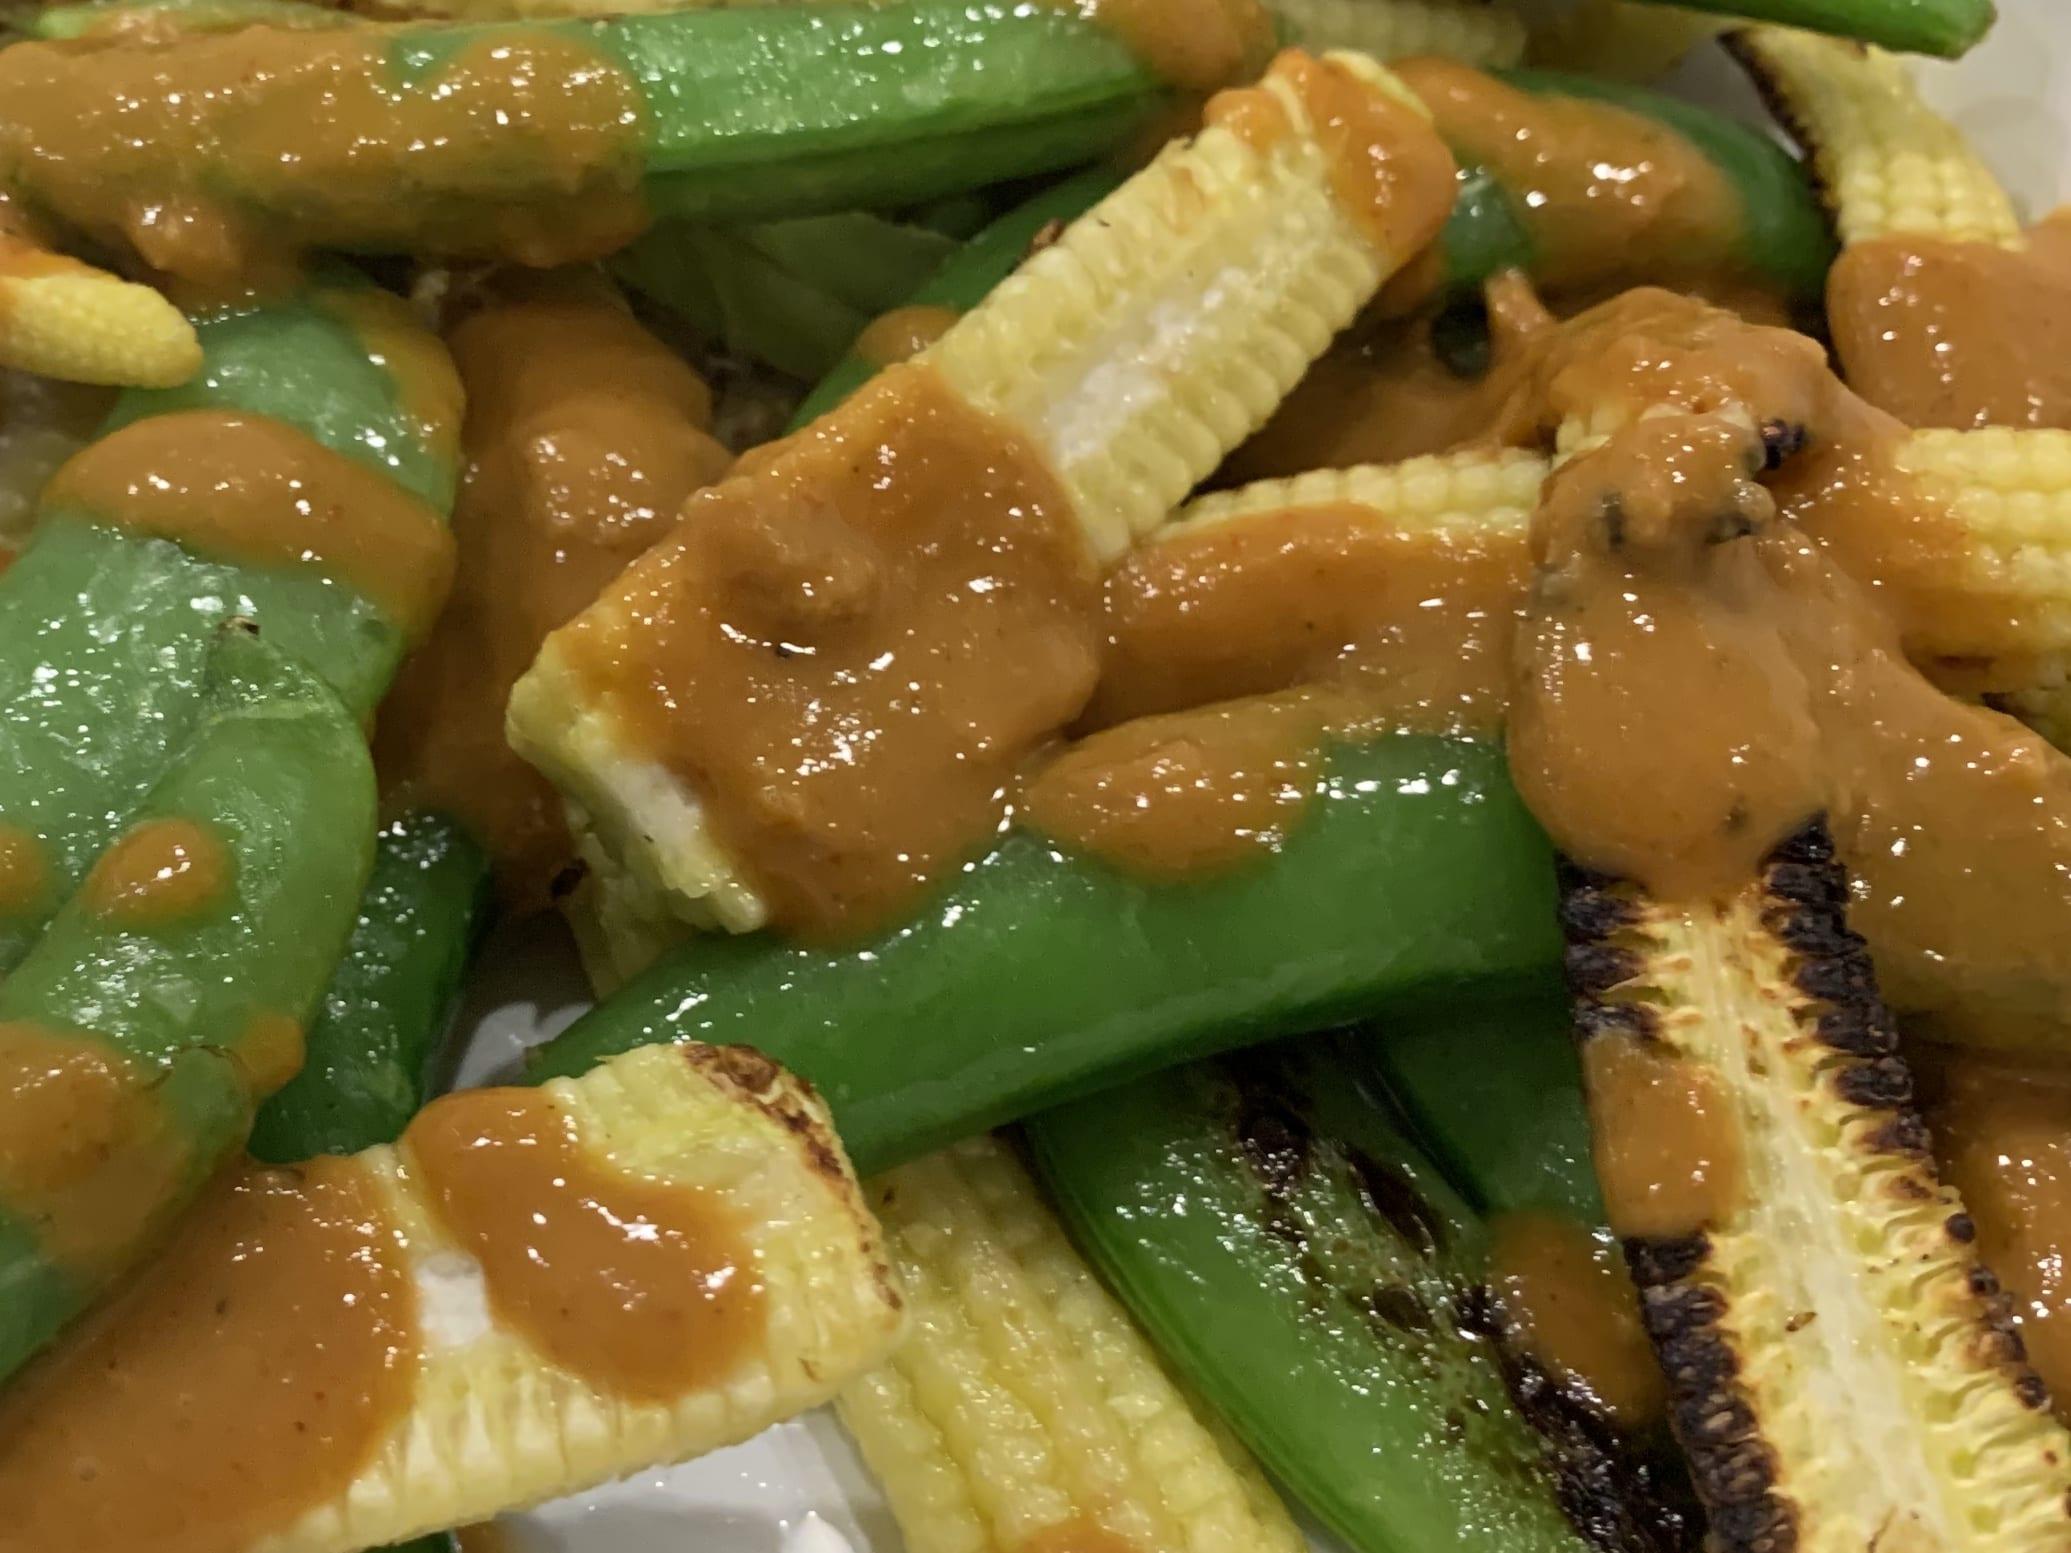 Charred baby sweet corn with peanut sauce